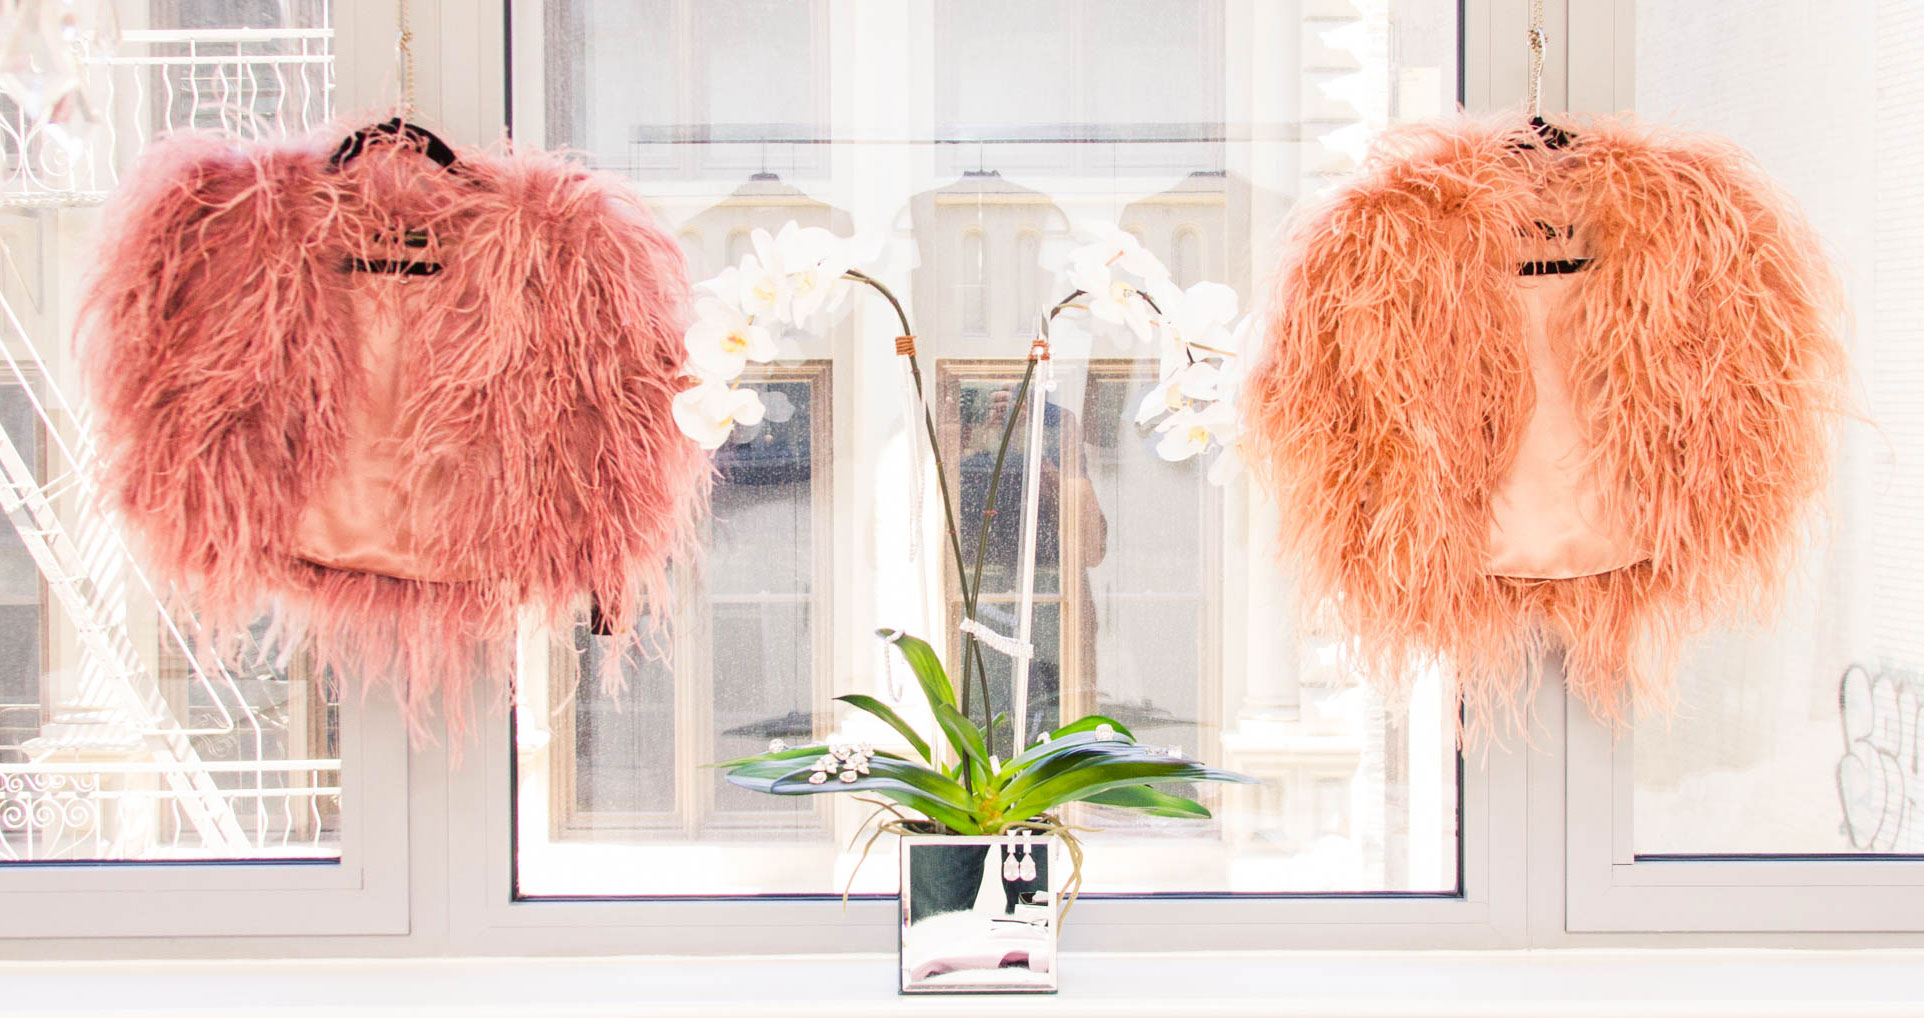 Bella Hadid's Stylist Let Us Raid Her Closet